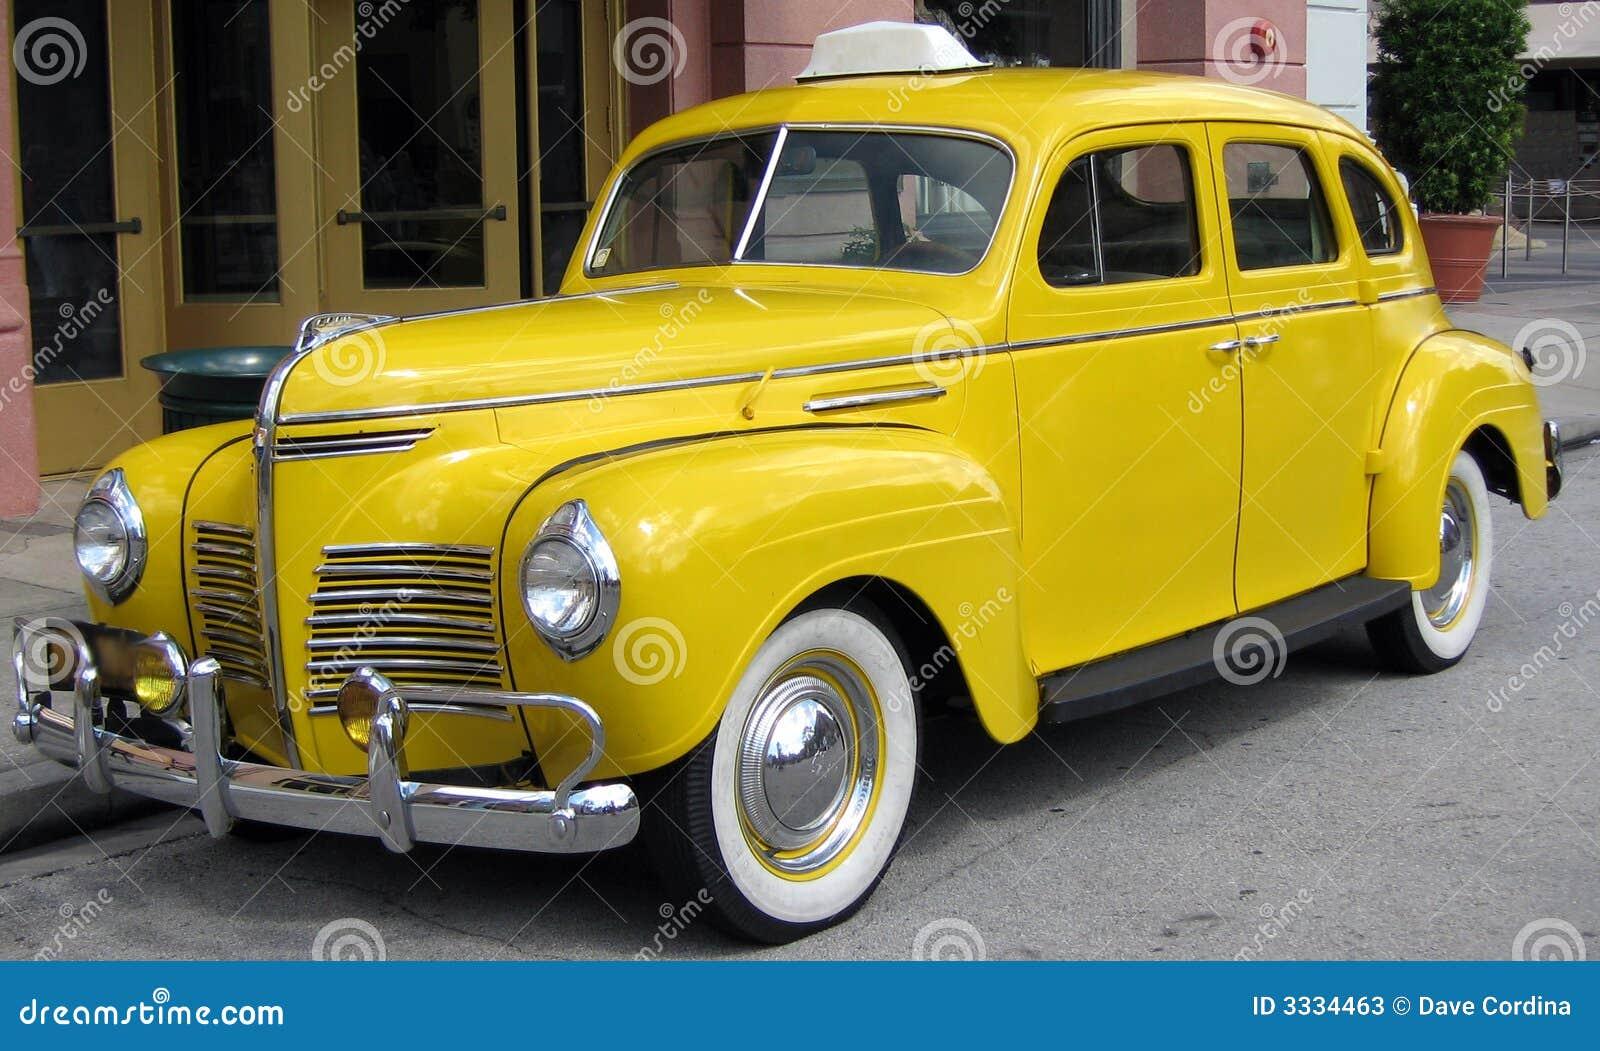 Yellow Taxi Stock Photos  Image 3334463